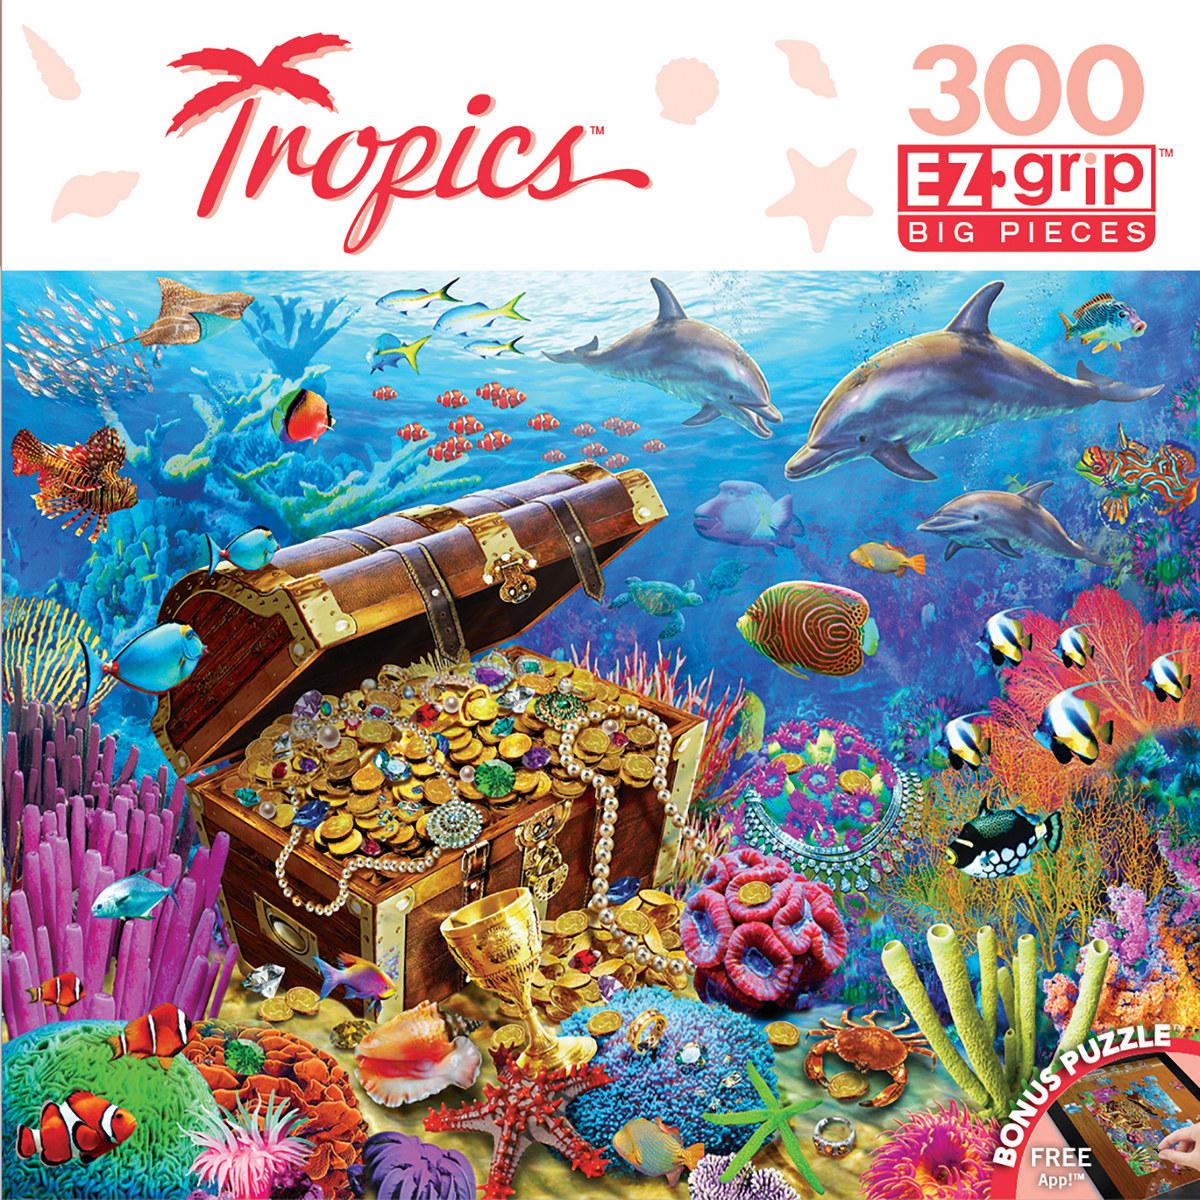 Lost Treasures Under The Sea Jigsaw Puzzle